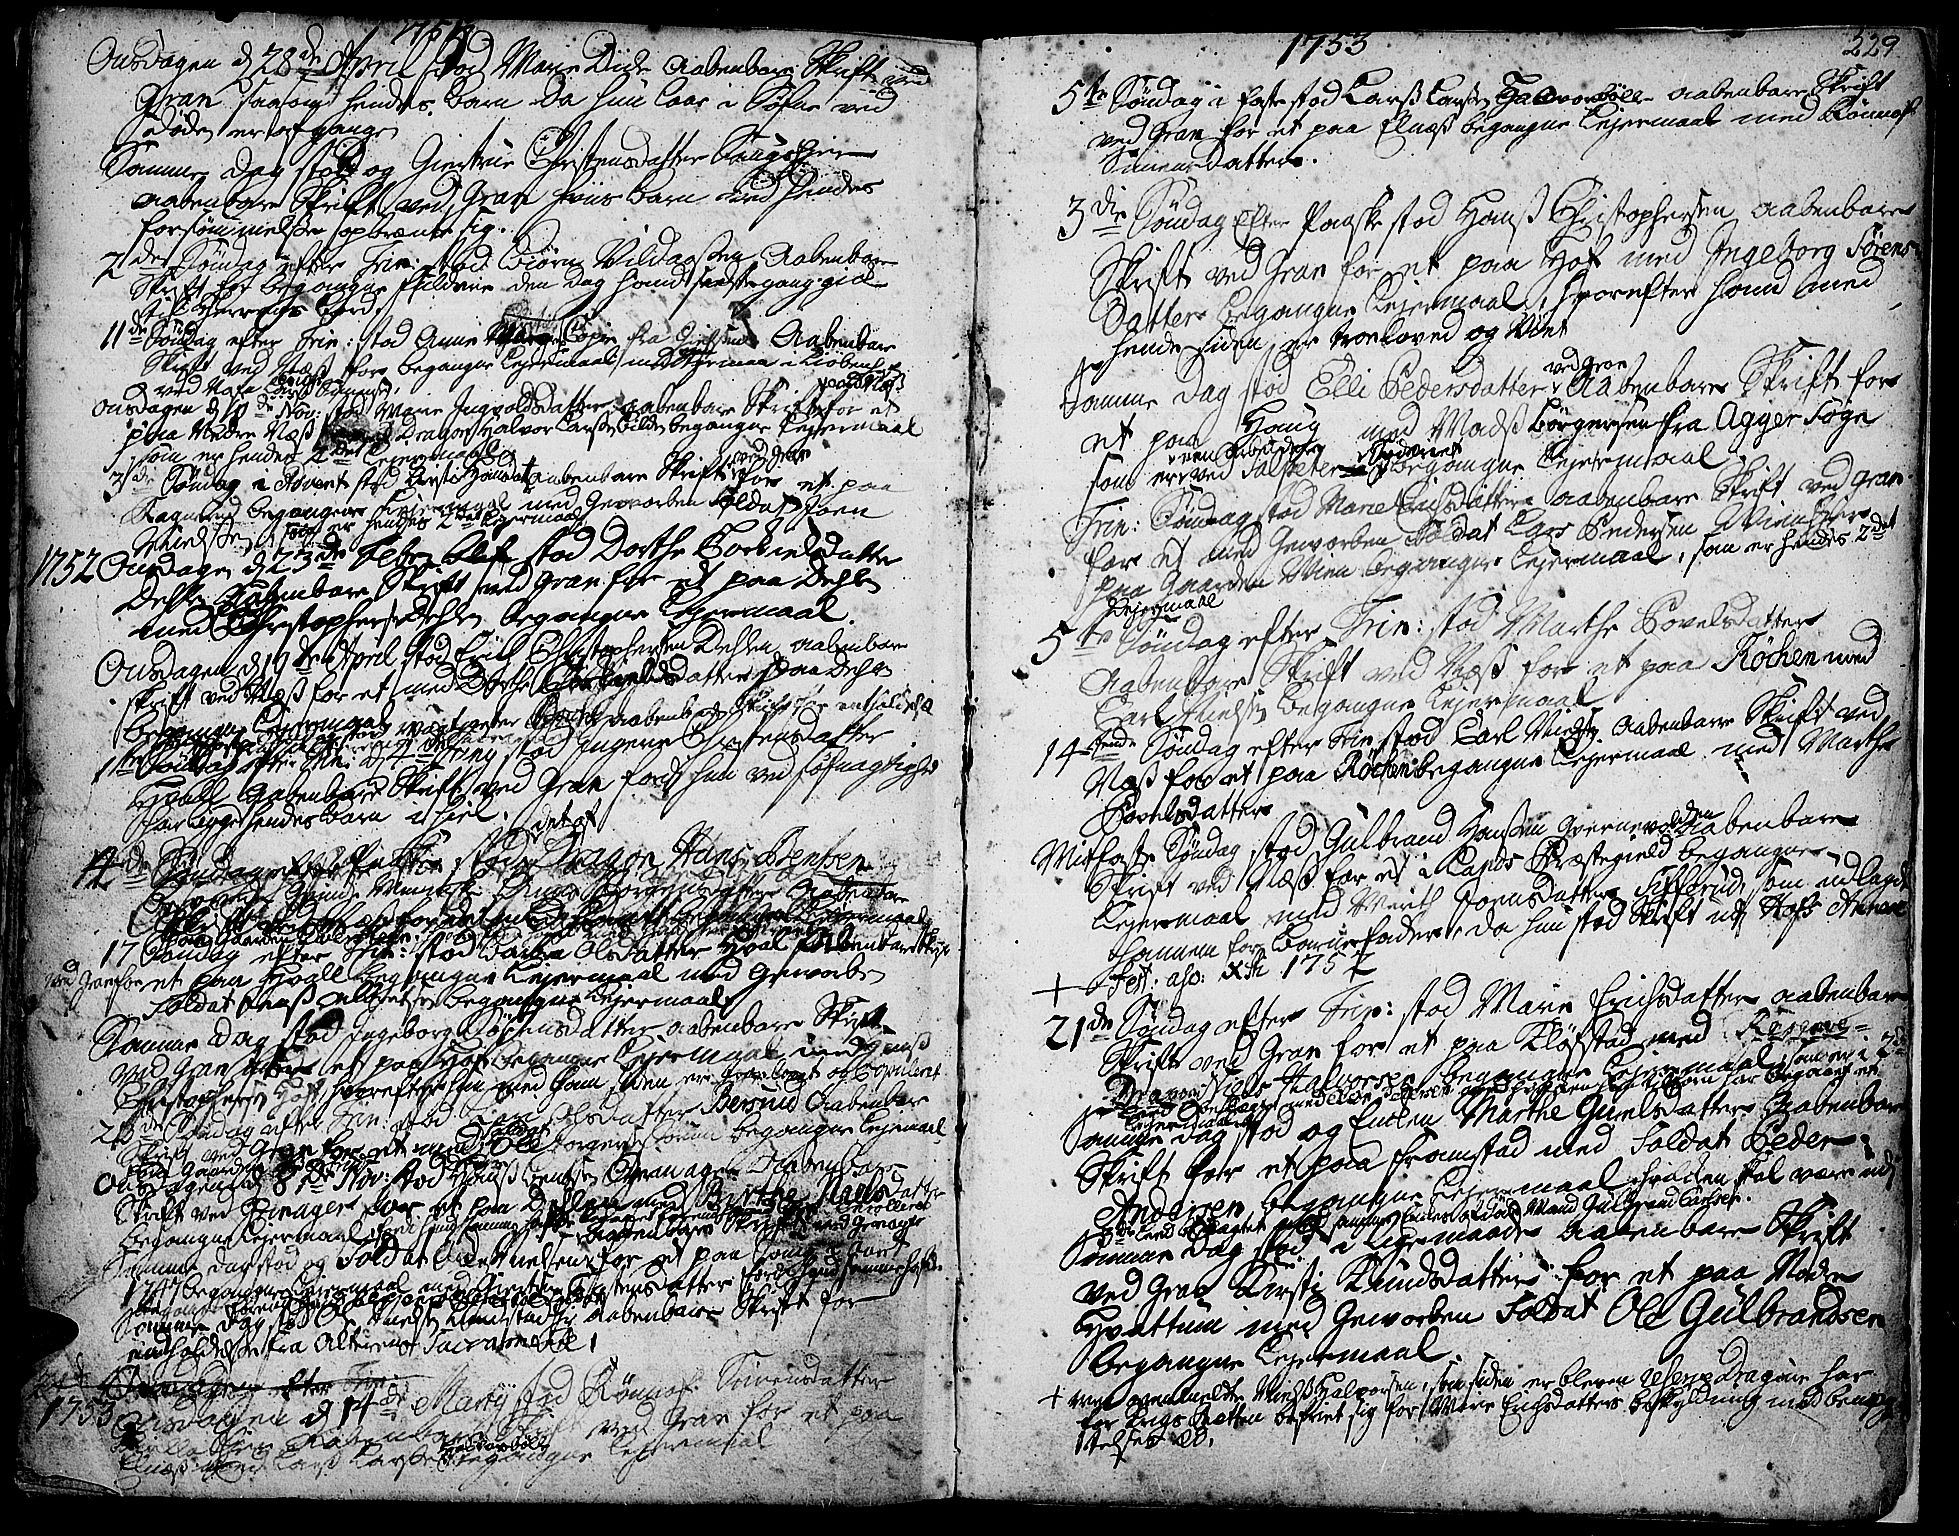 SAH, Gran prestekontor, Ministerialbok nr. 3, 1745-1758, s. 229